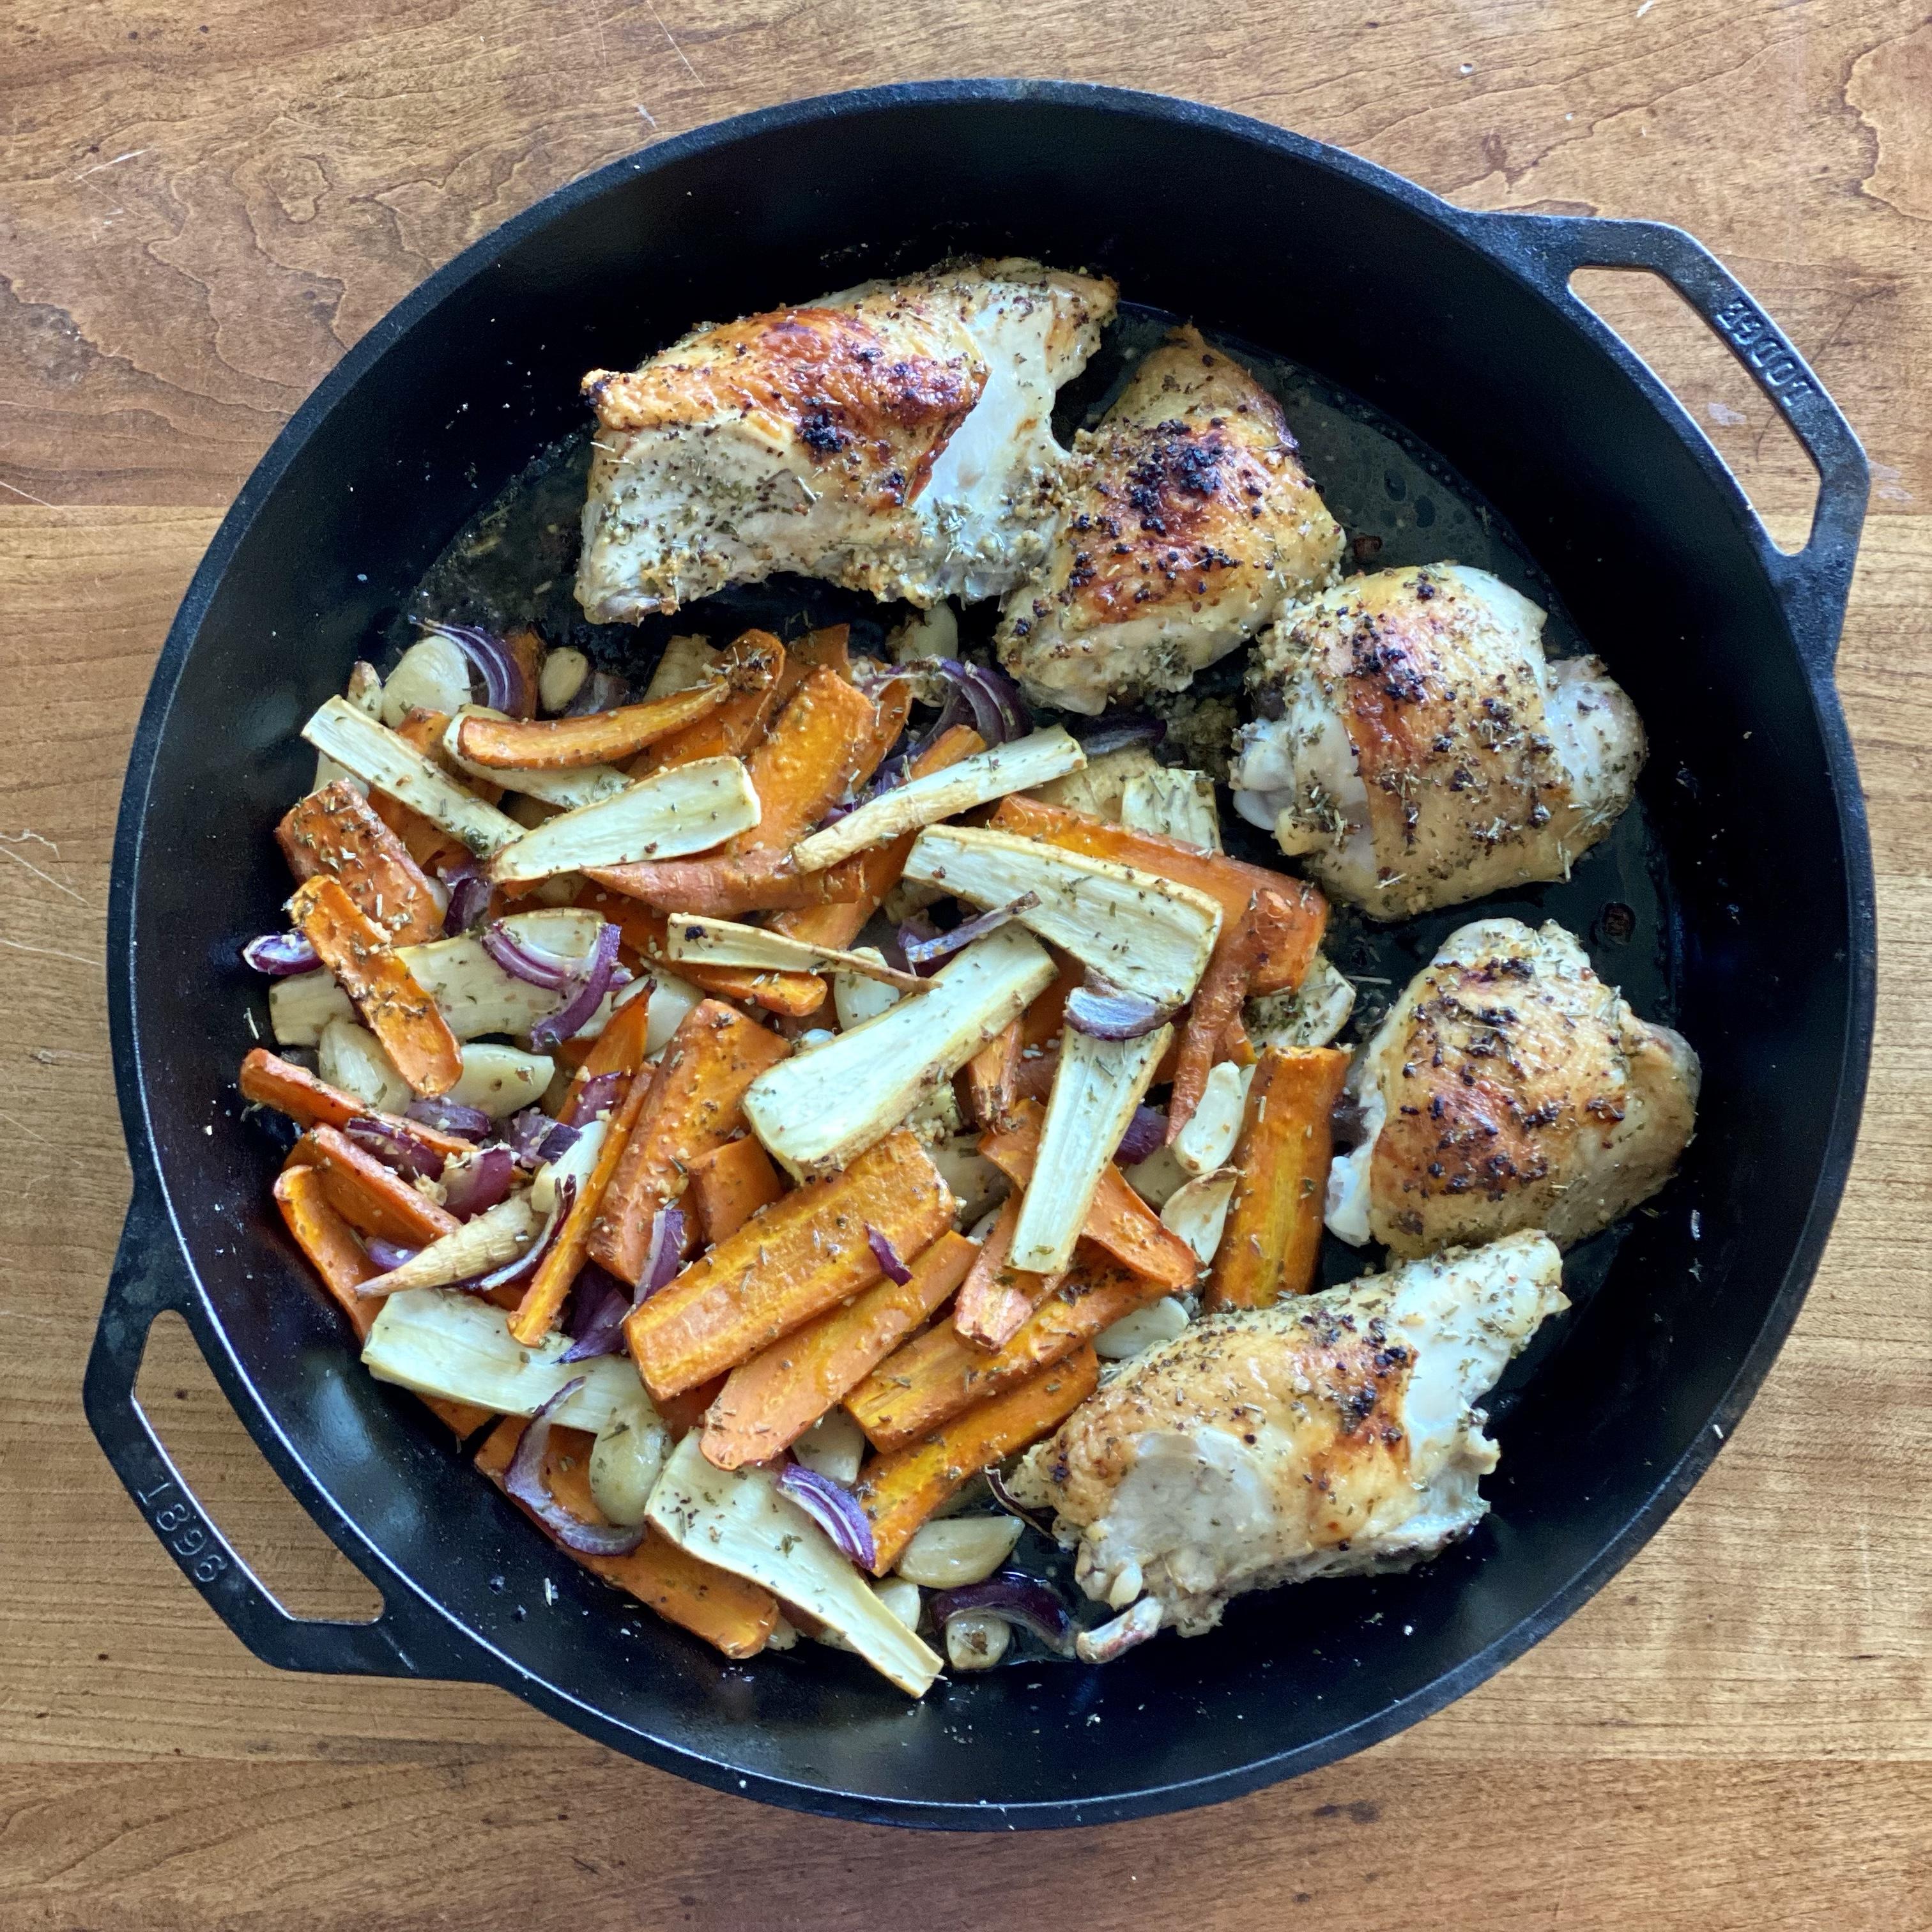 Roasted Garlic Chicken, Carrots & Parsnips